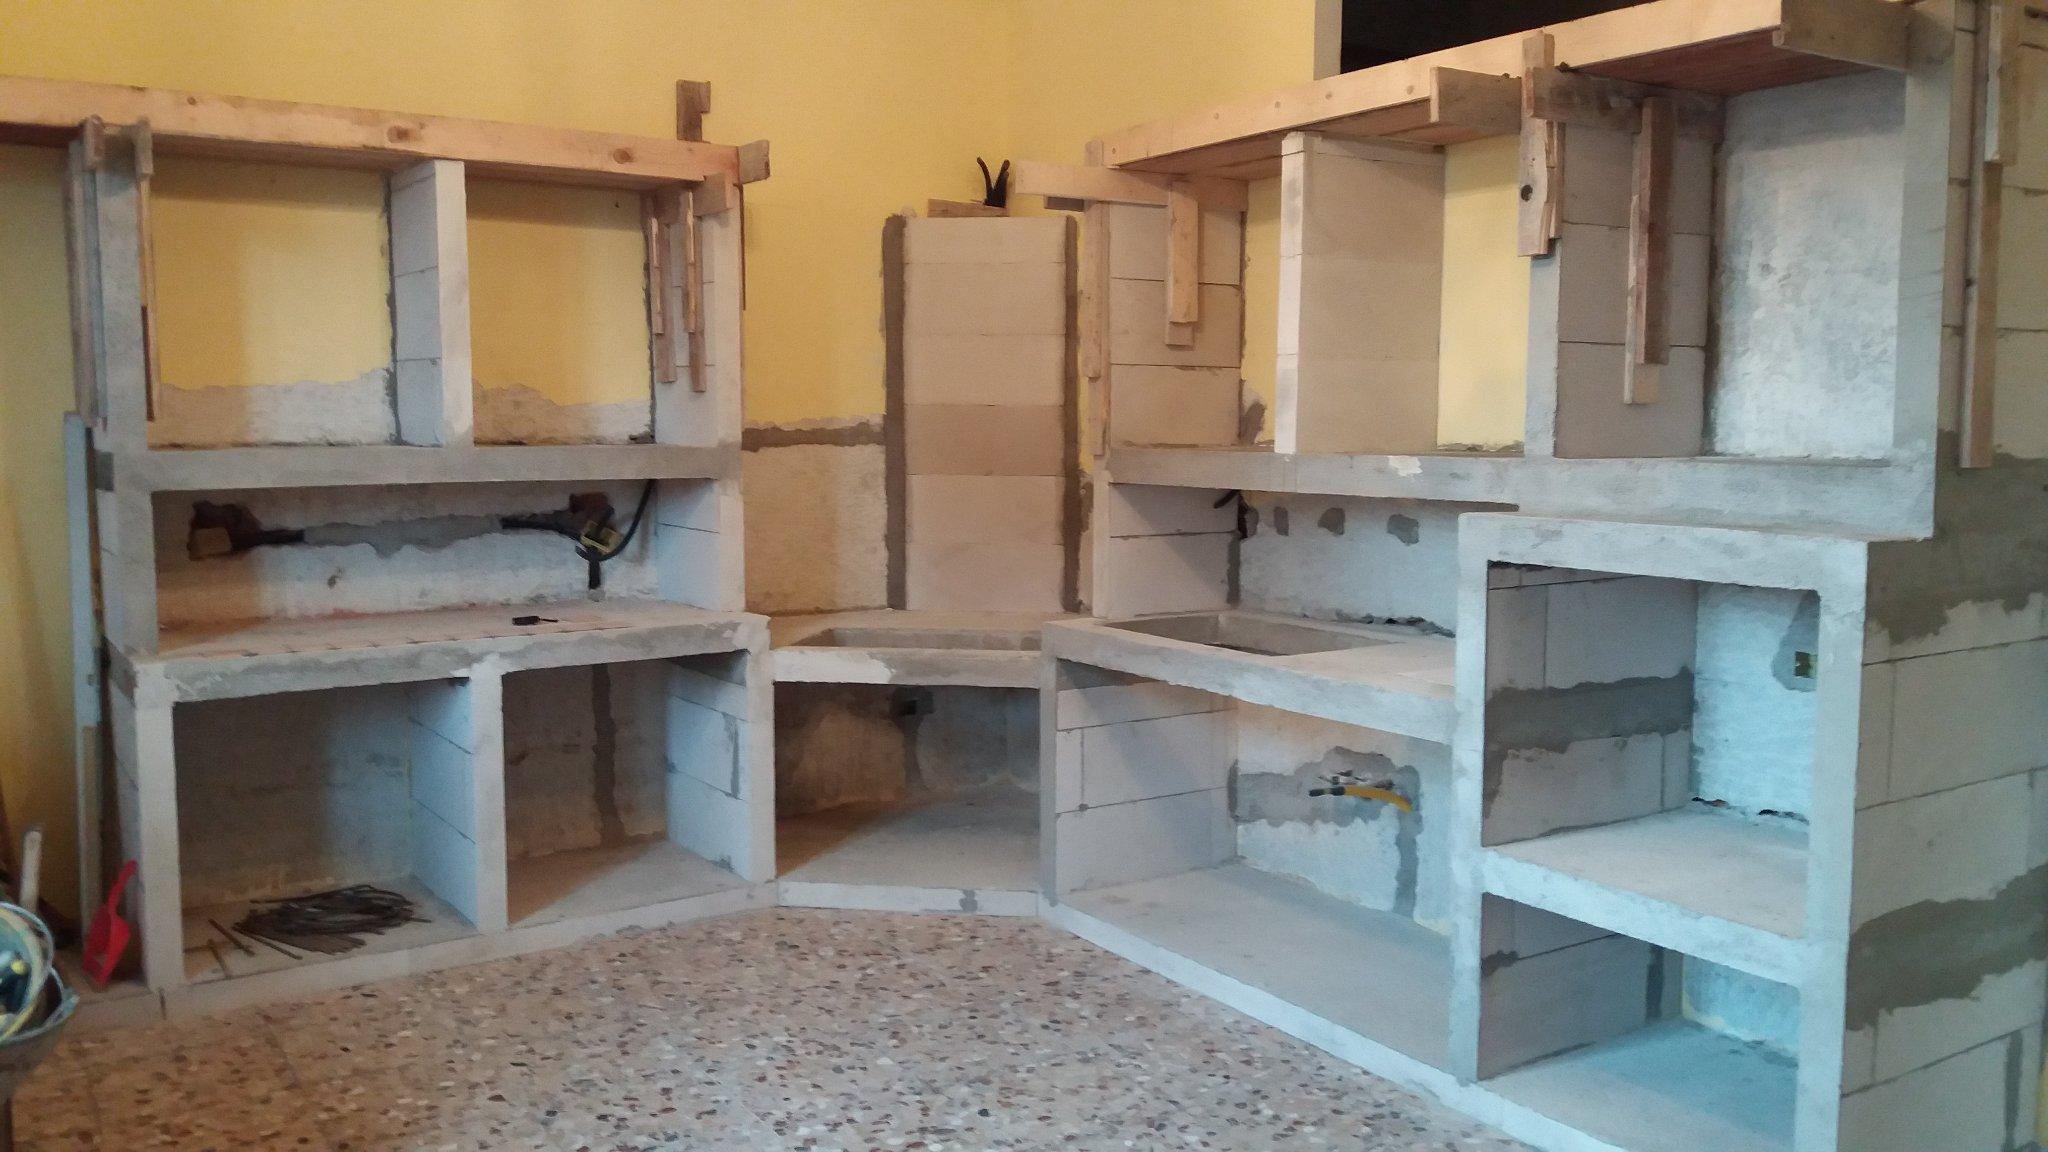 Pensili Cucina Rustica   Cucina In Muratura Fadini Mobili Cerea Verona